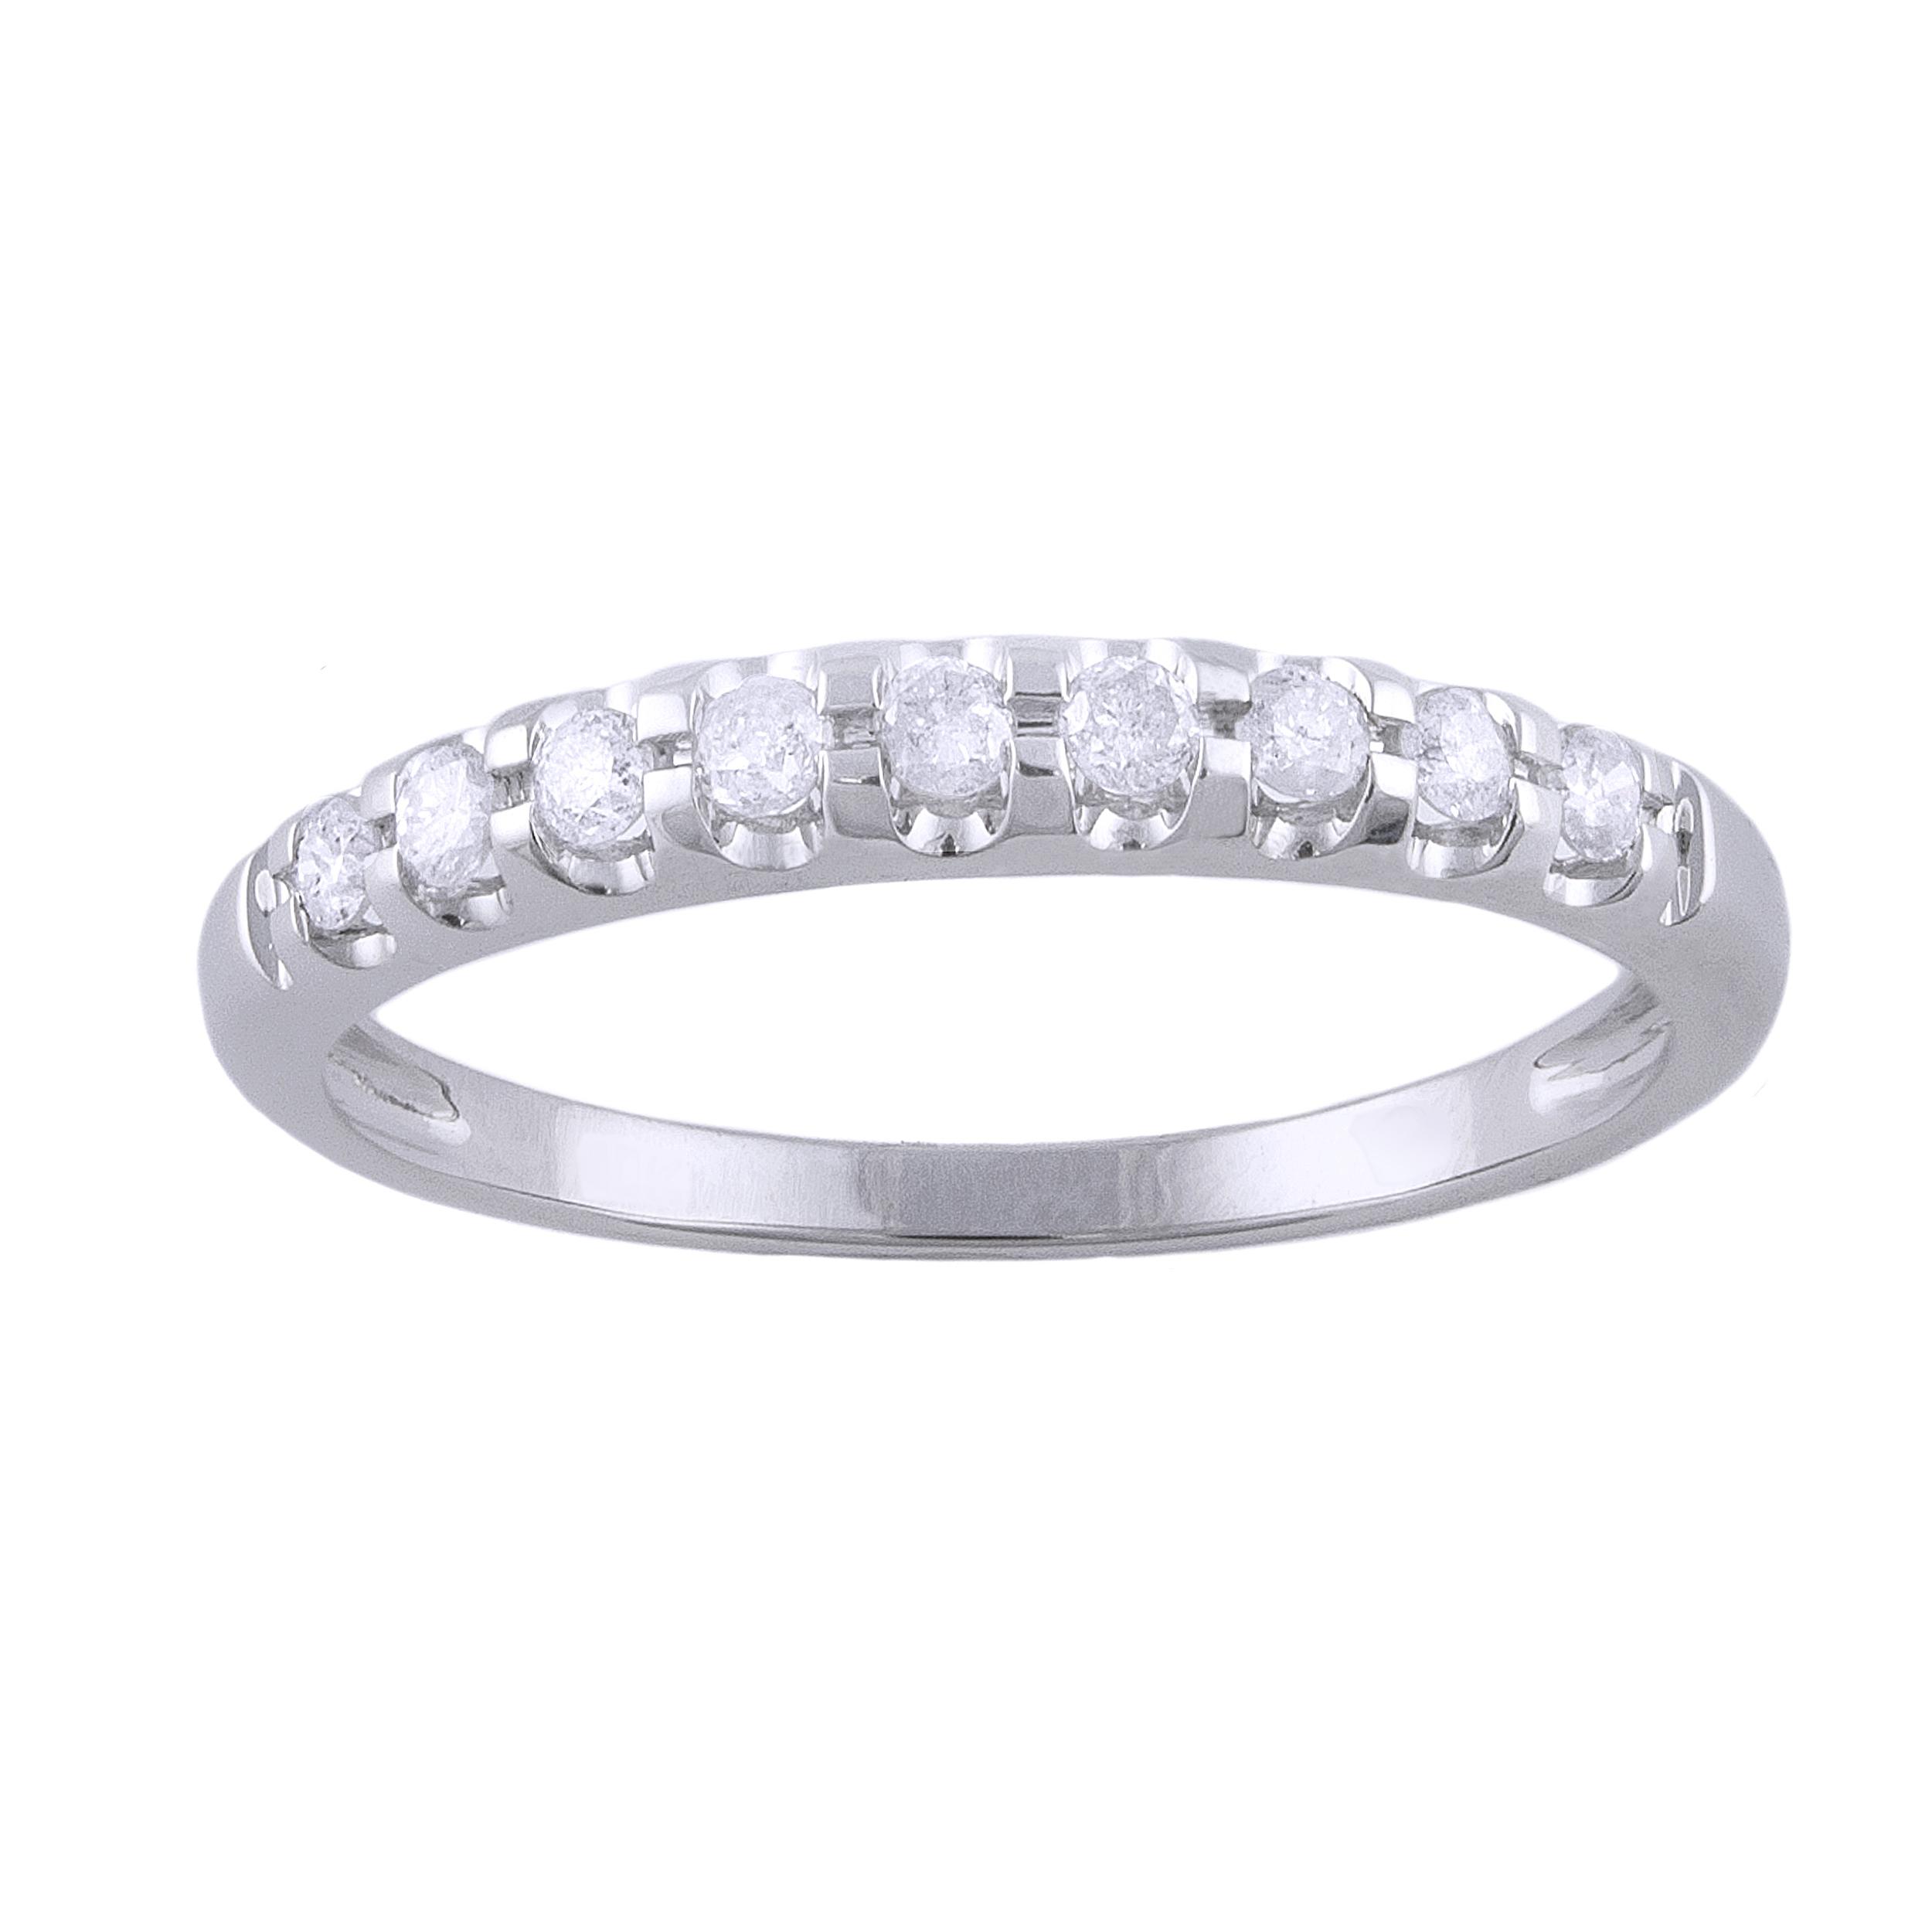 14K White Gold 1/5 carat Diamond Semi Eternity Band Ring